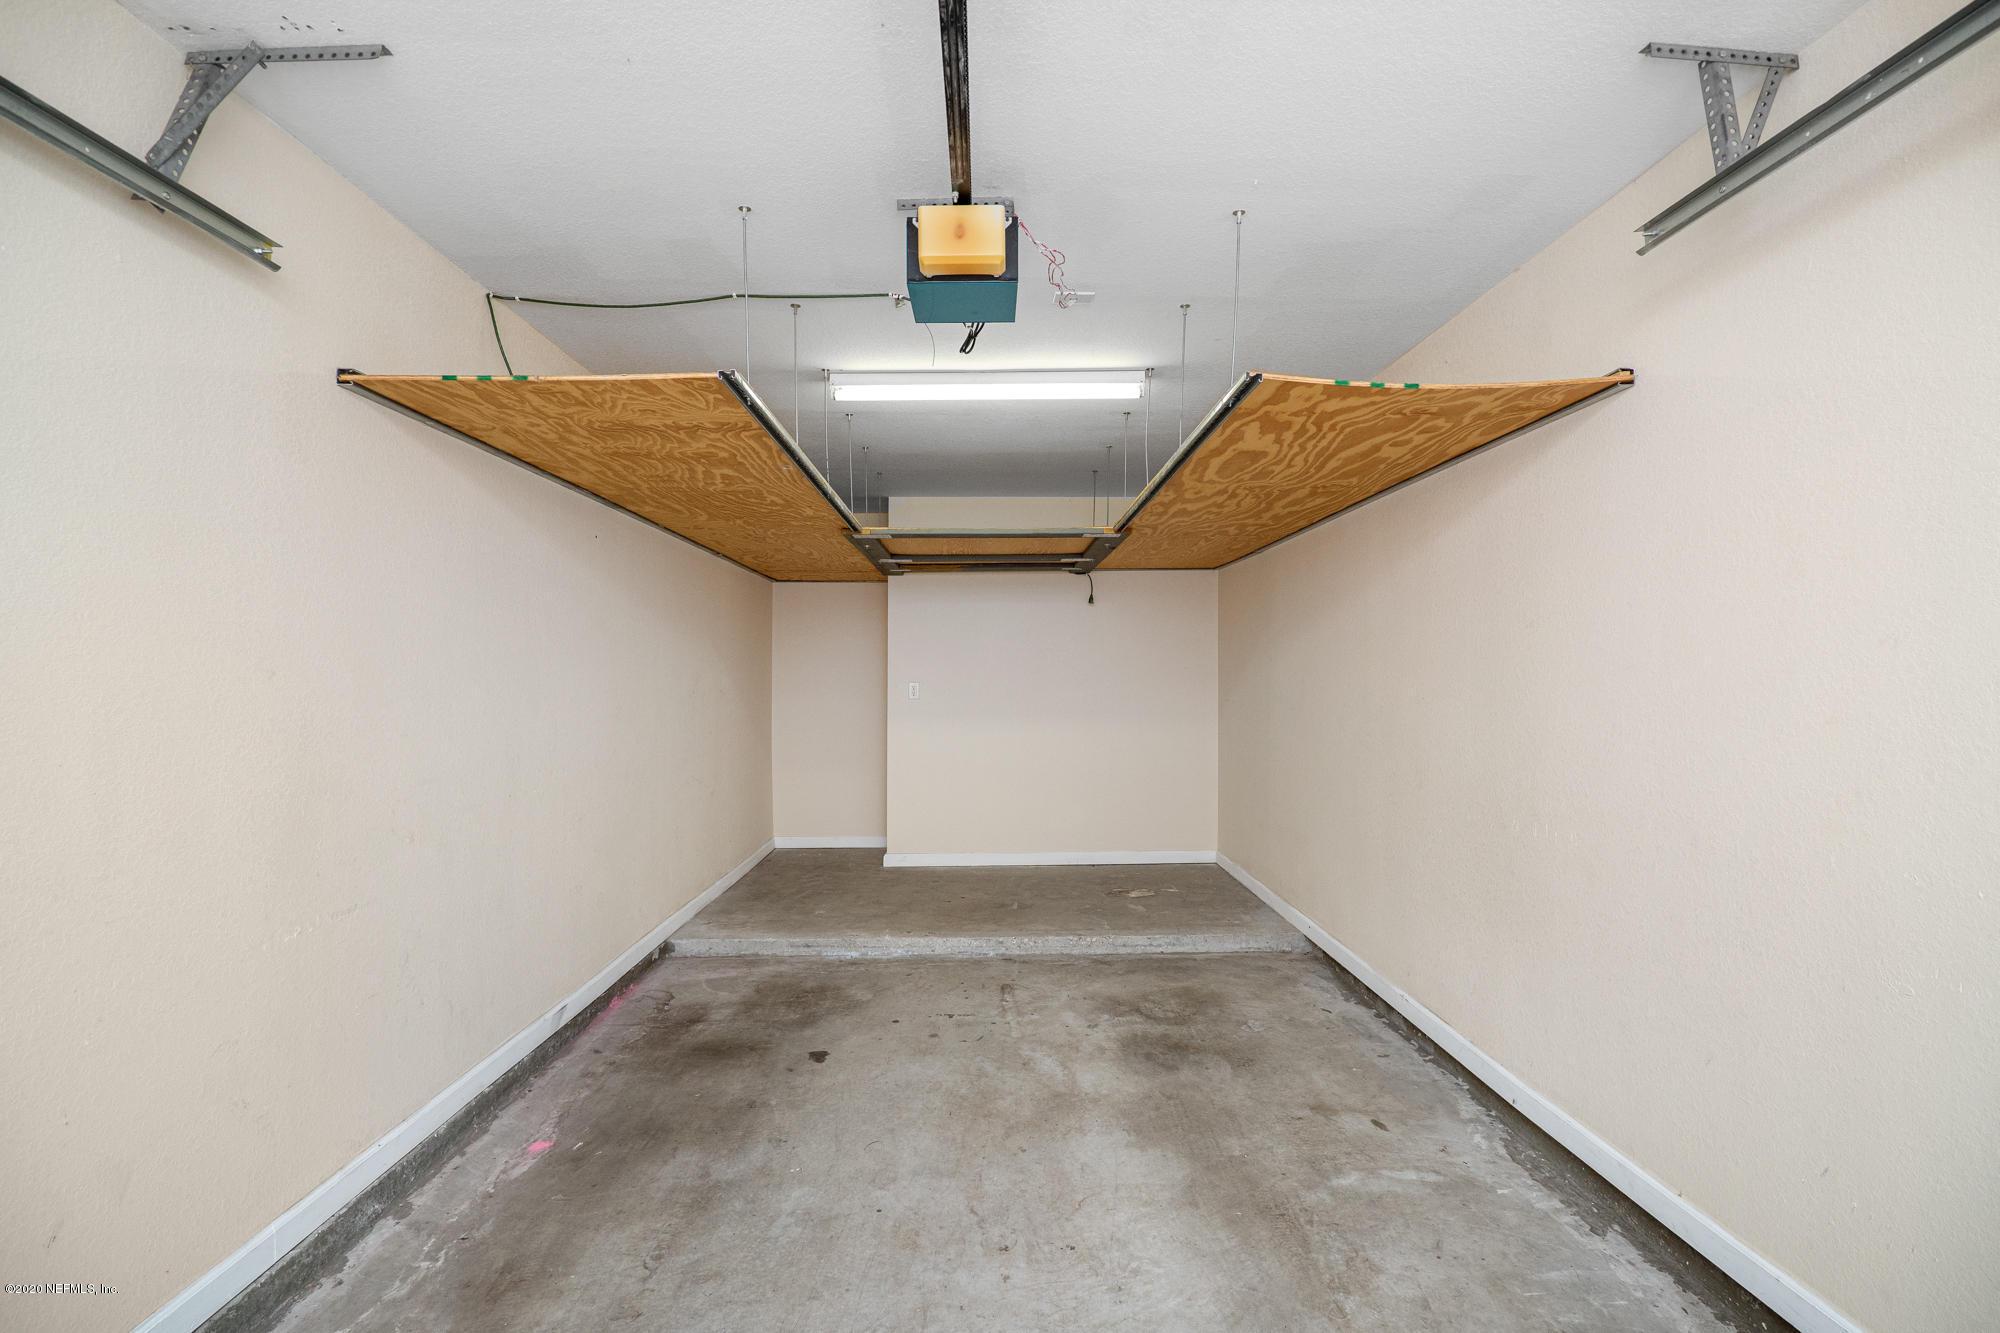 10075 GATE, JACKSONVILLE, FLORIDA 32246, 3 Bedrooms Bedrooms, ,2 BathroomsBathrooms,Residential,For sale,GATE,1080578